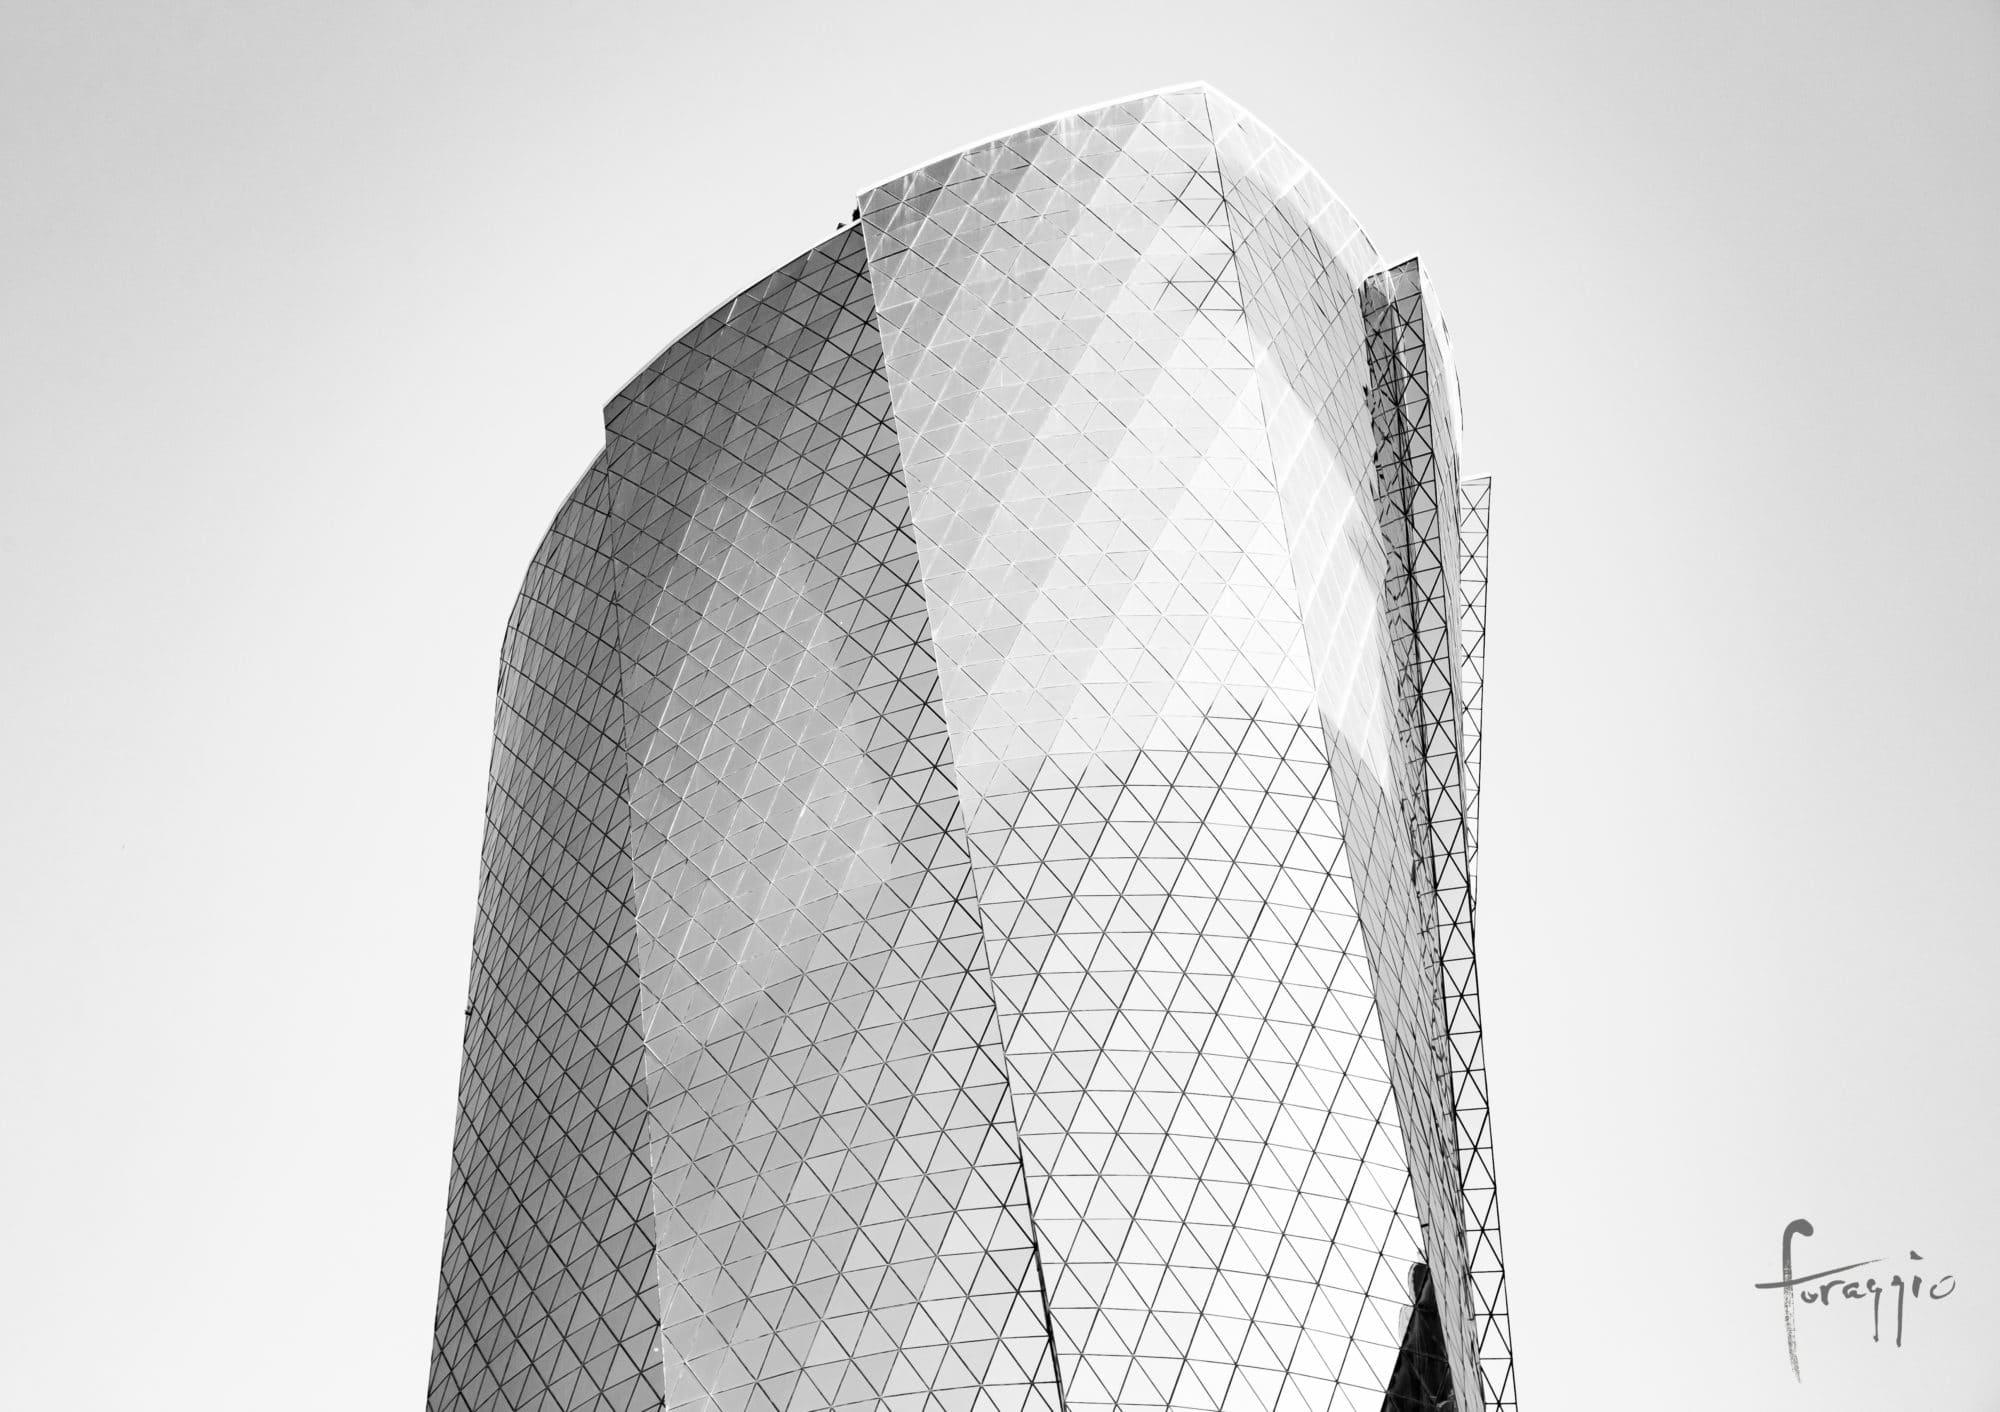 Starkitecture | Al Bidda Tower, Doha | Foraggio Photographic